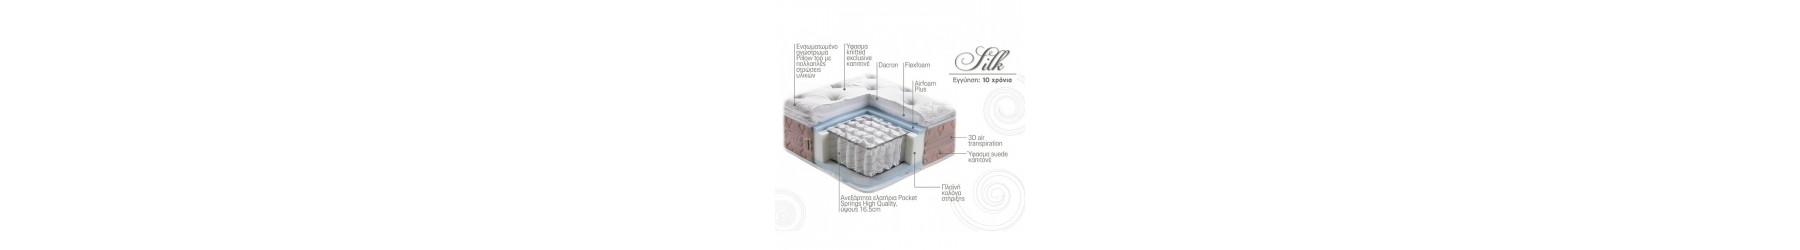 SILK Στρώματα με ανατομικό και ορθοπεδικό σχεδιασμό